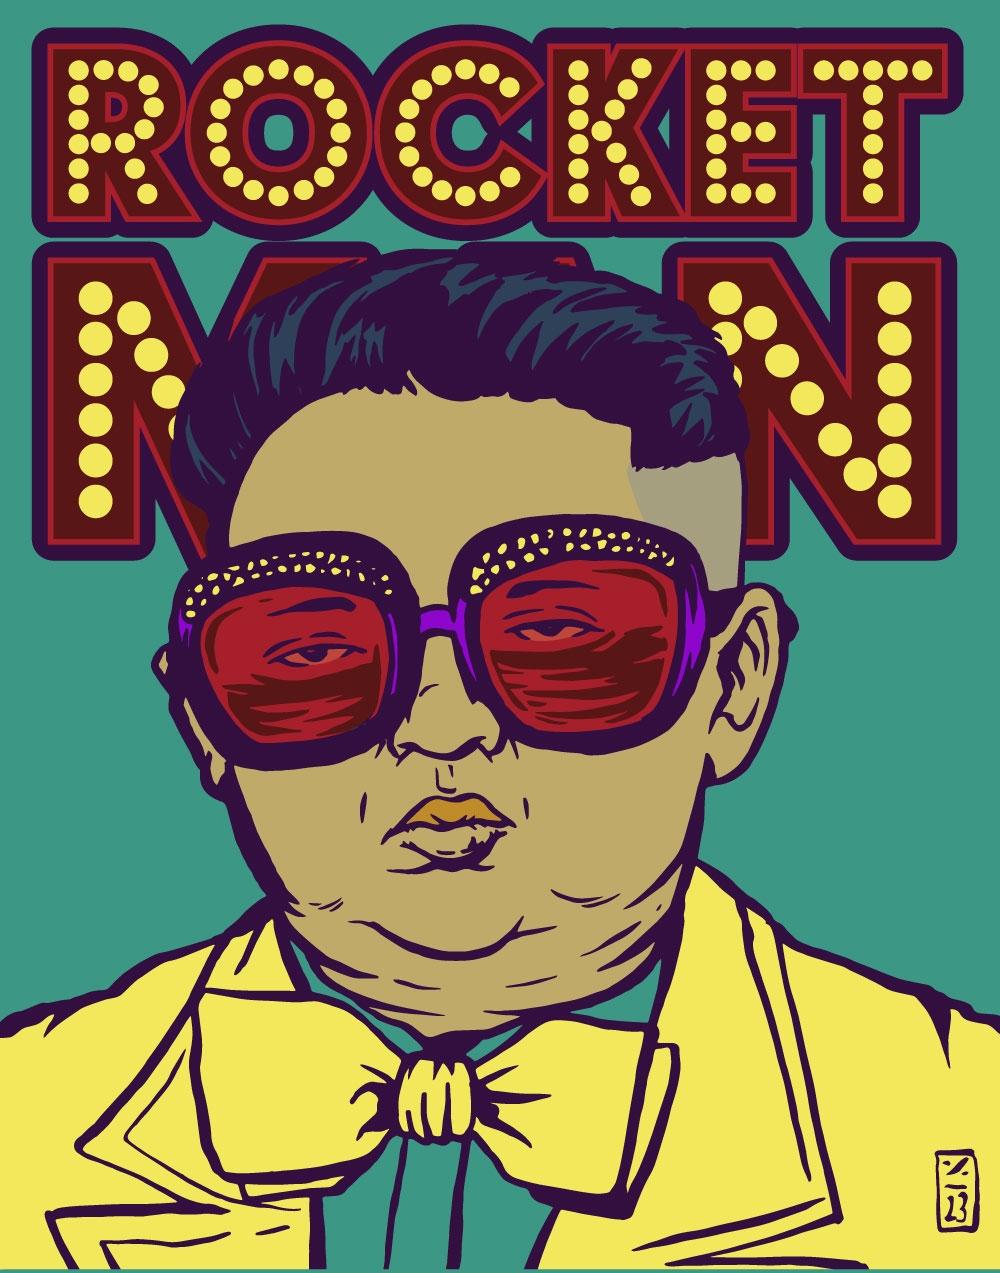 Rocket Man, North Korea - illustration - thomcat23 | ello